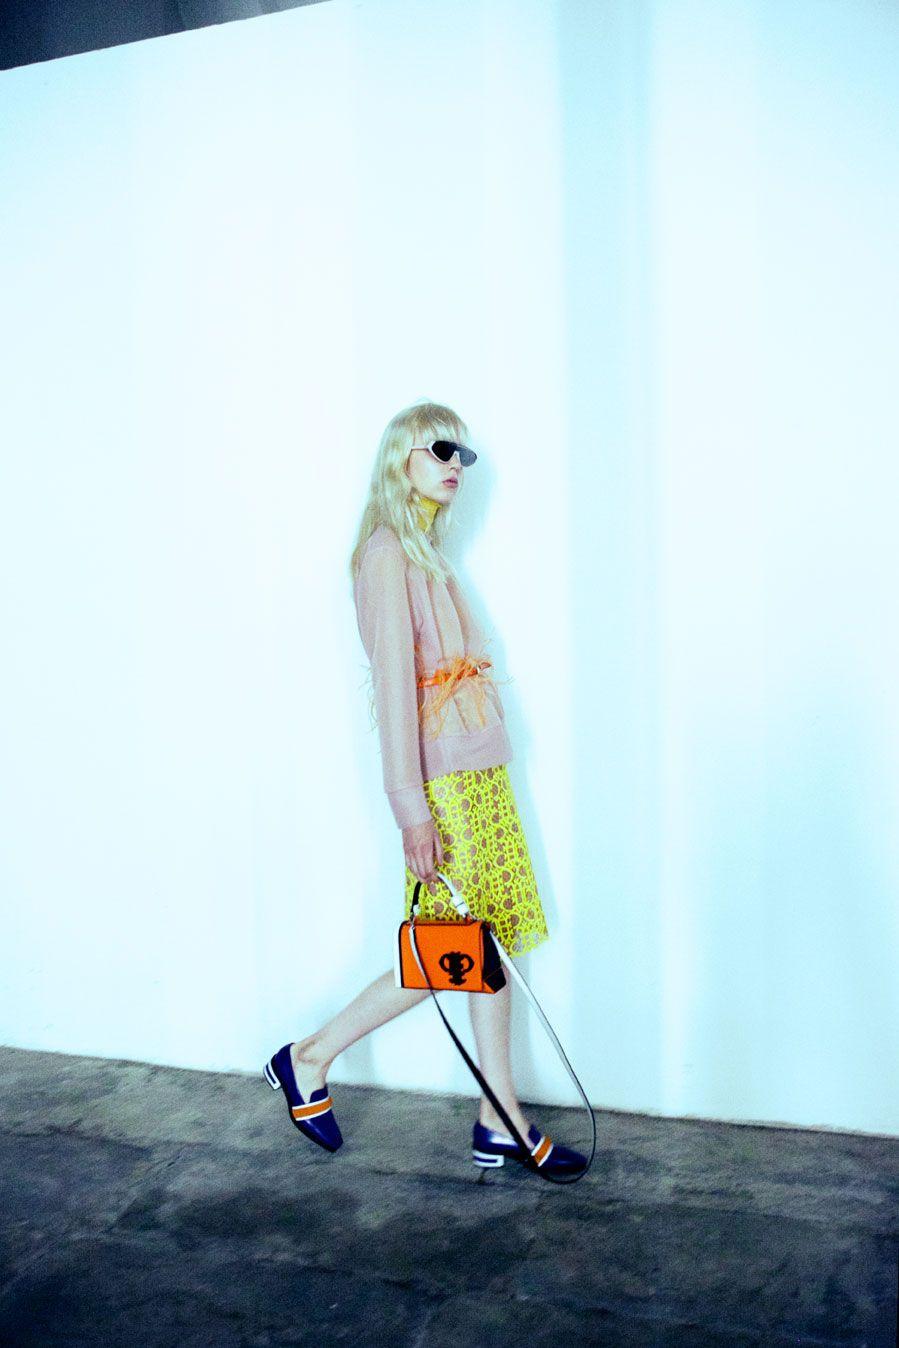 Toni&Guy per Emilio Pucci Pitti Firenze shooting Womenswear preview spring/summer 2016